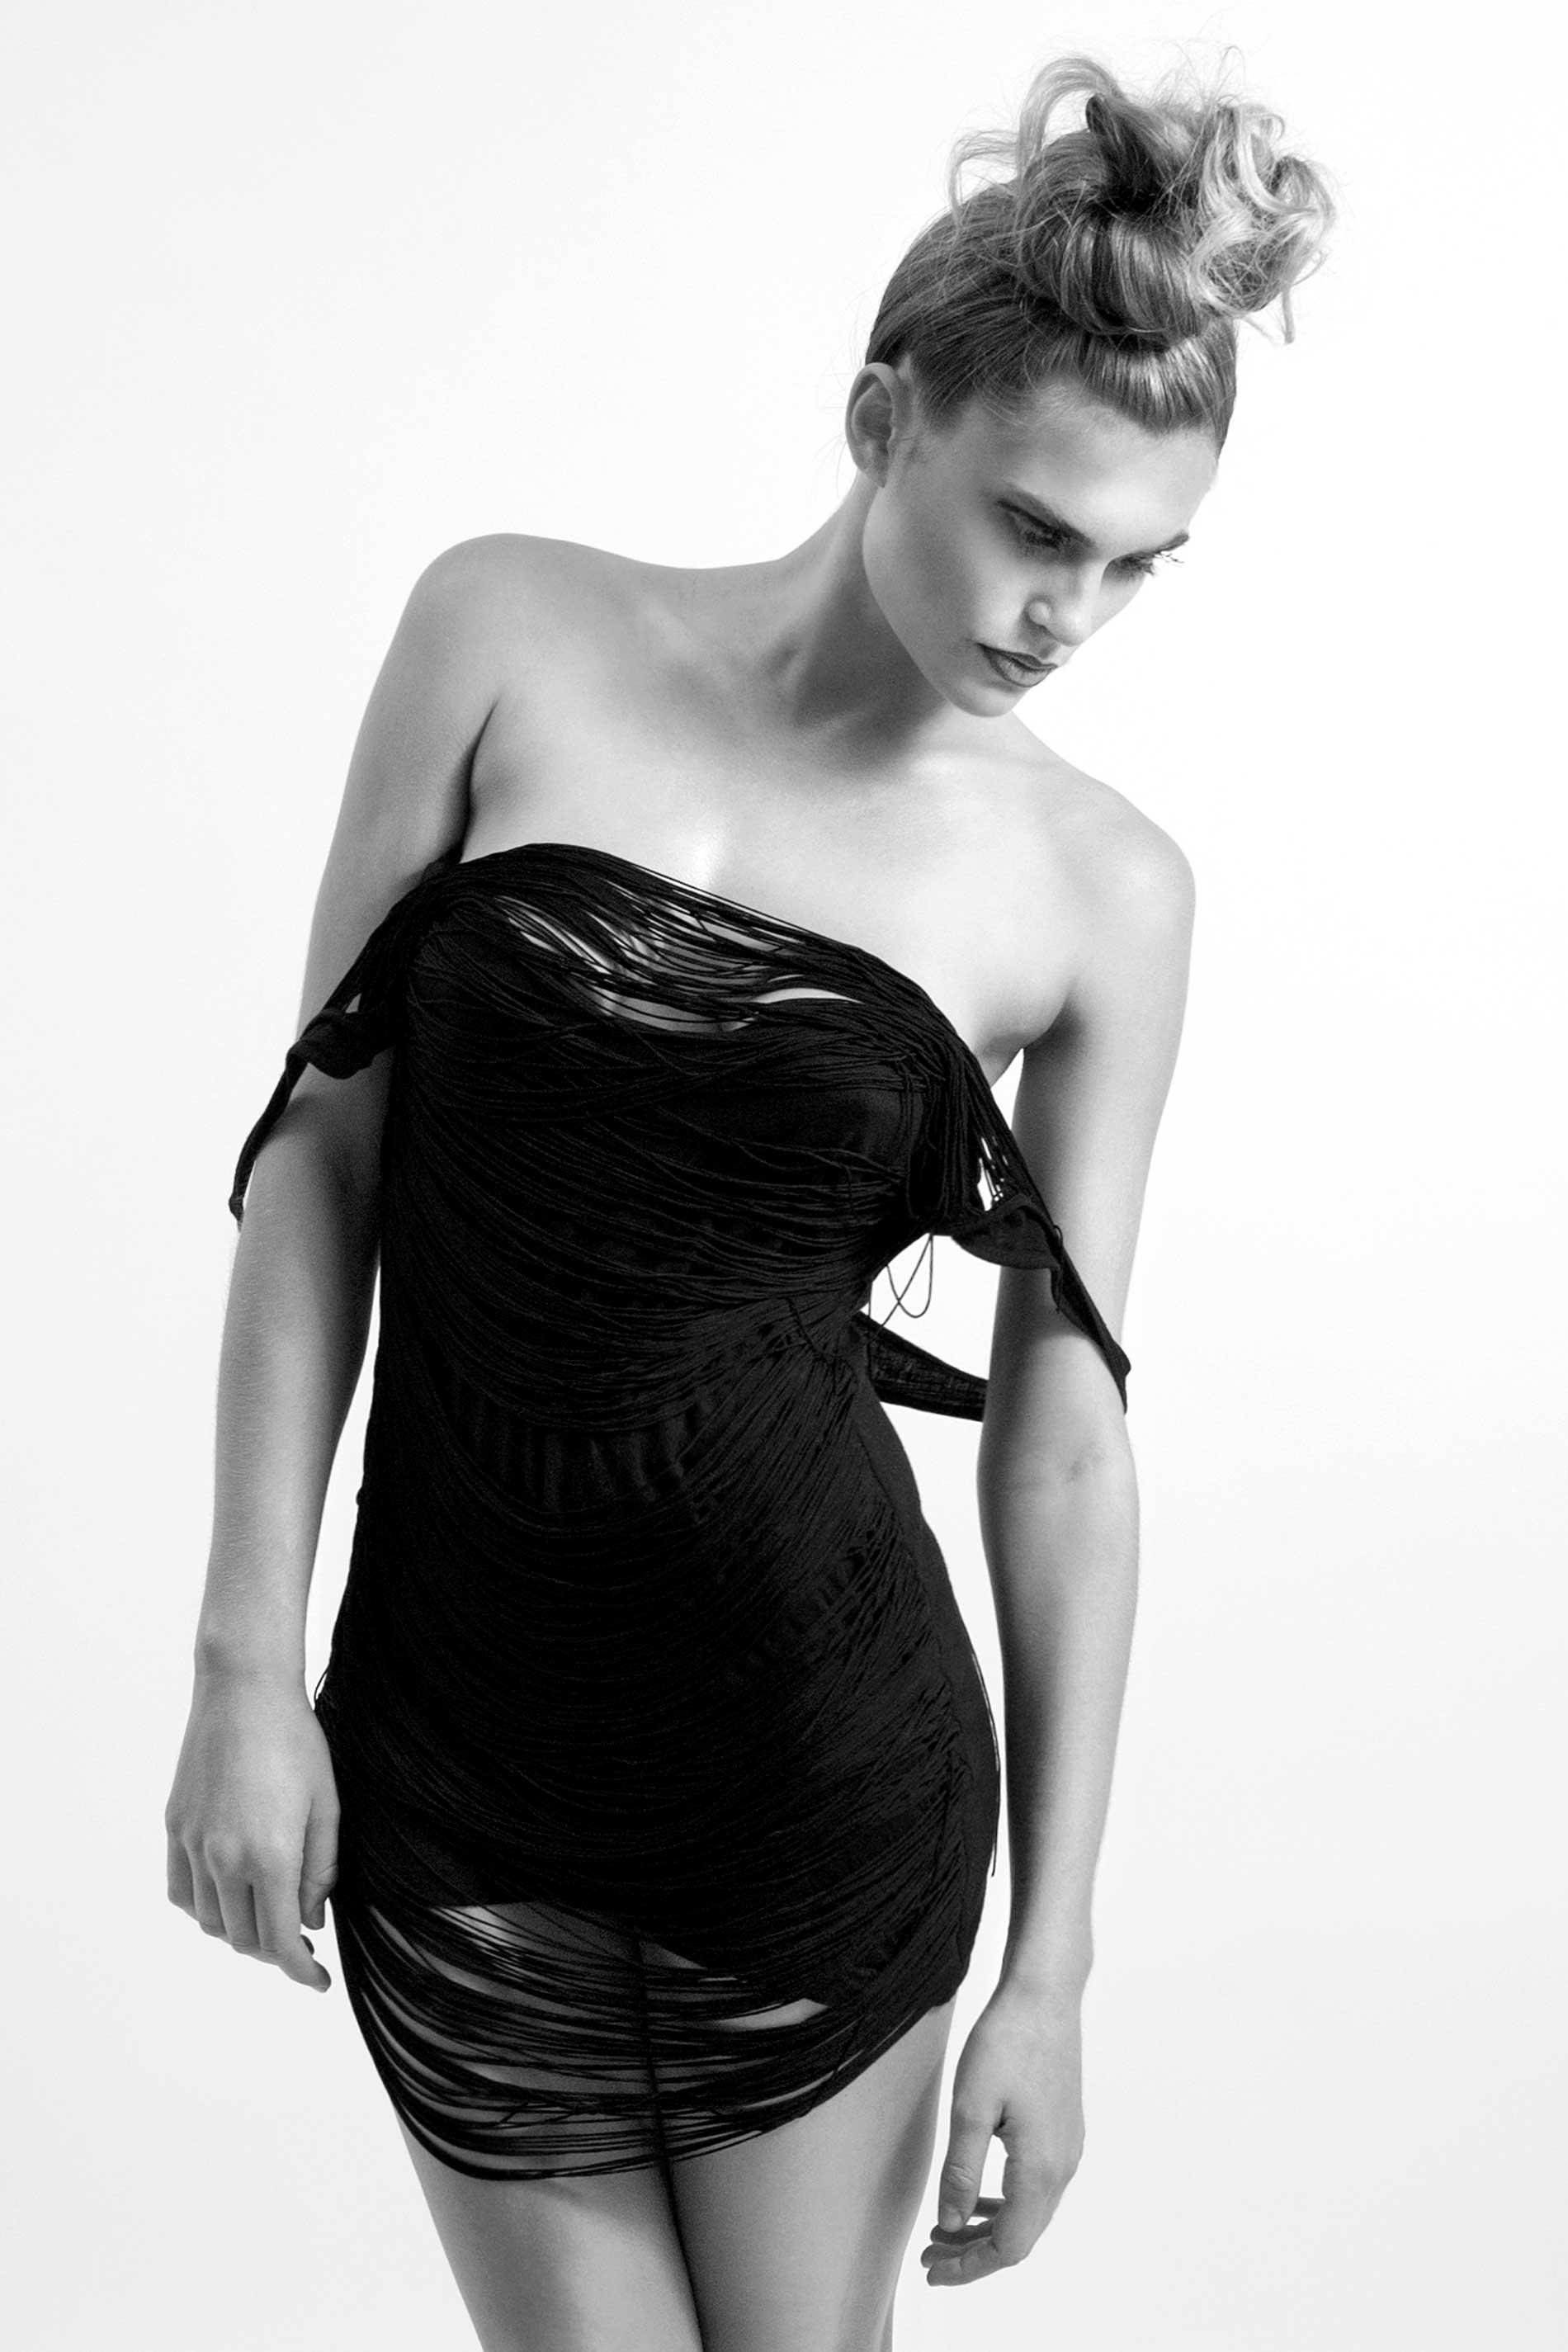 _alicia-oliveri-professional-make-up-artist-new-york-city-38.jpg